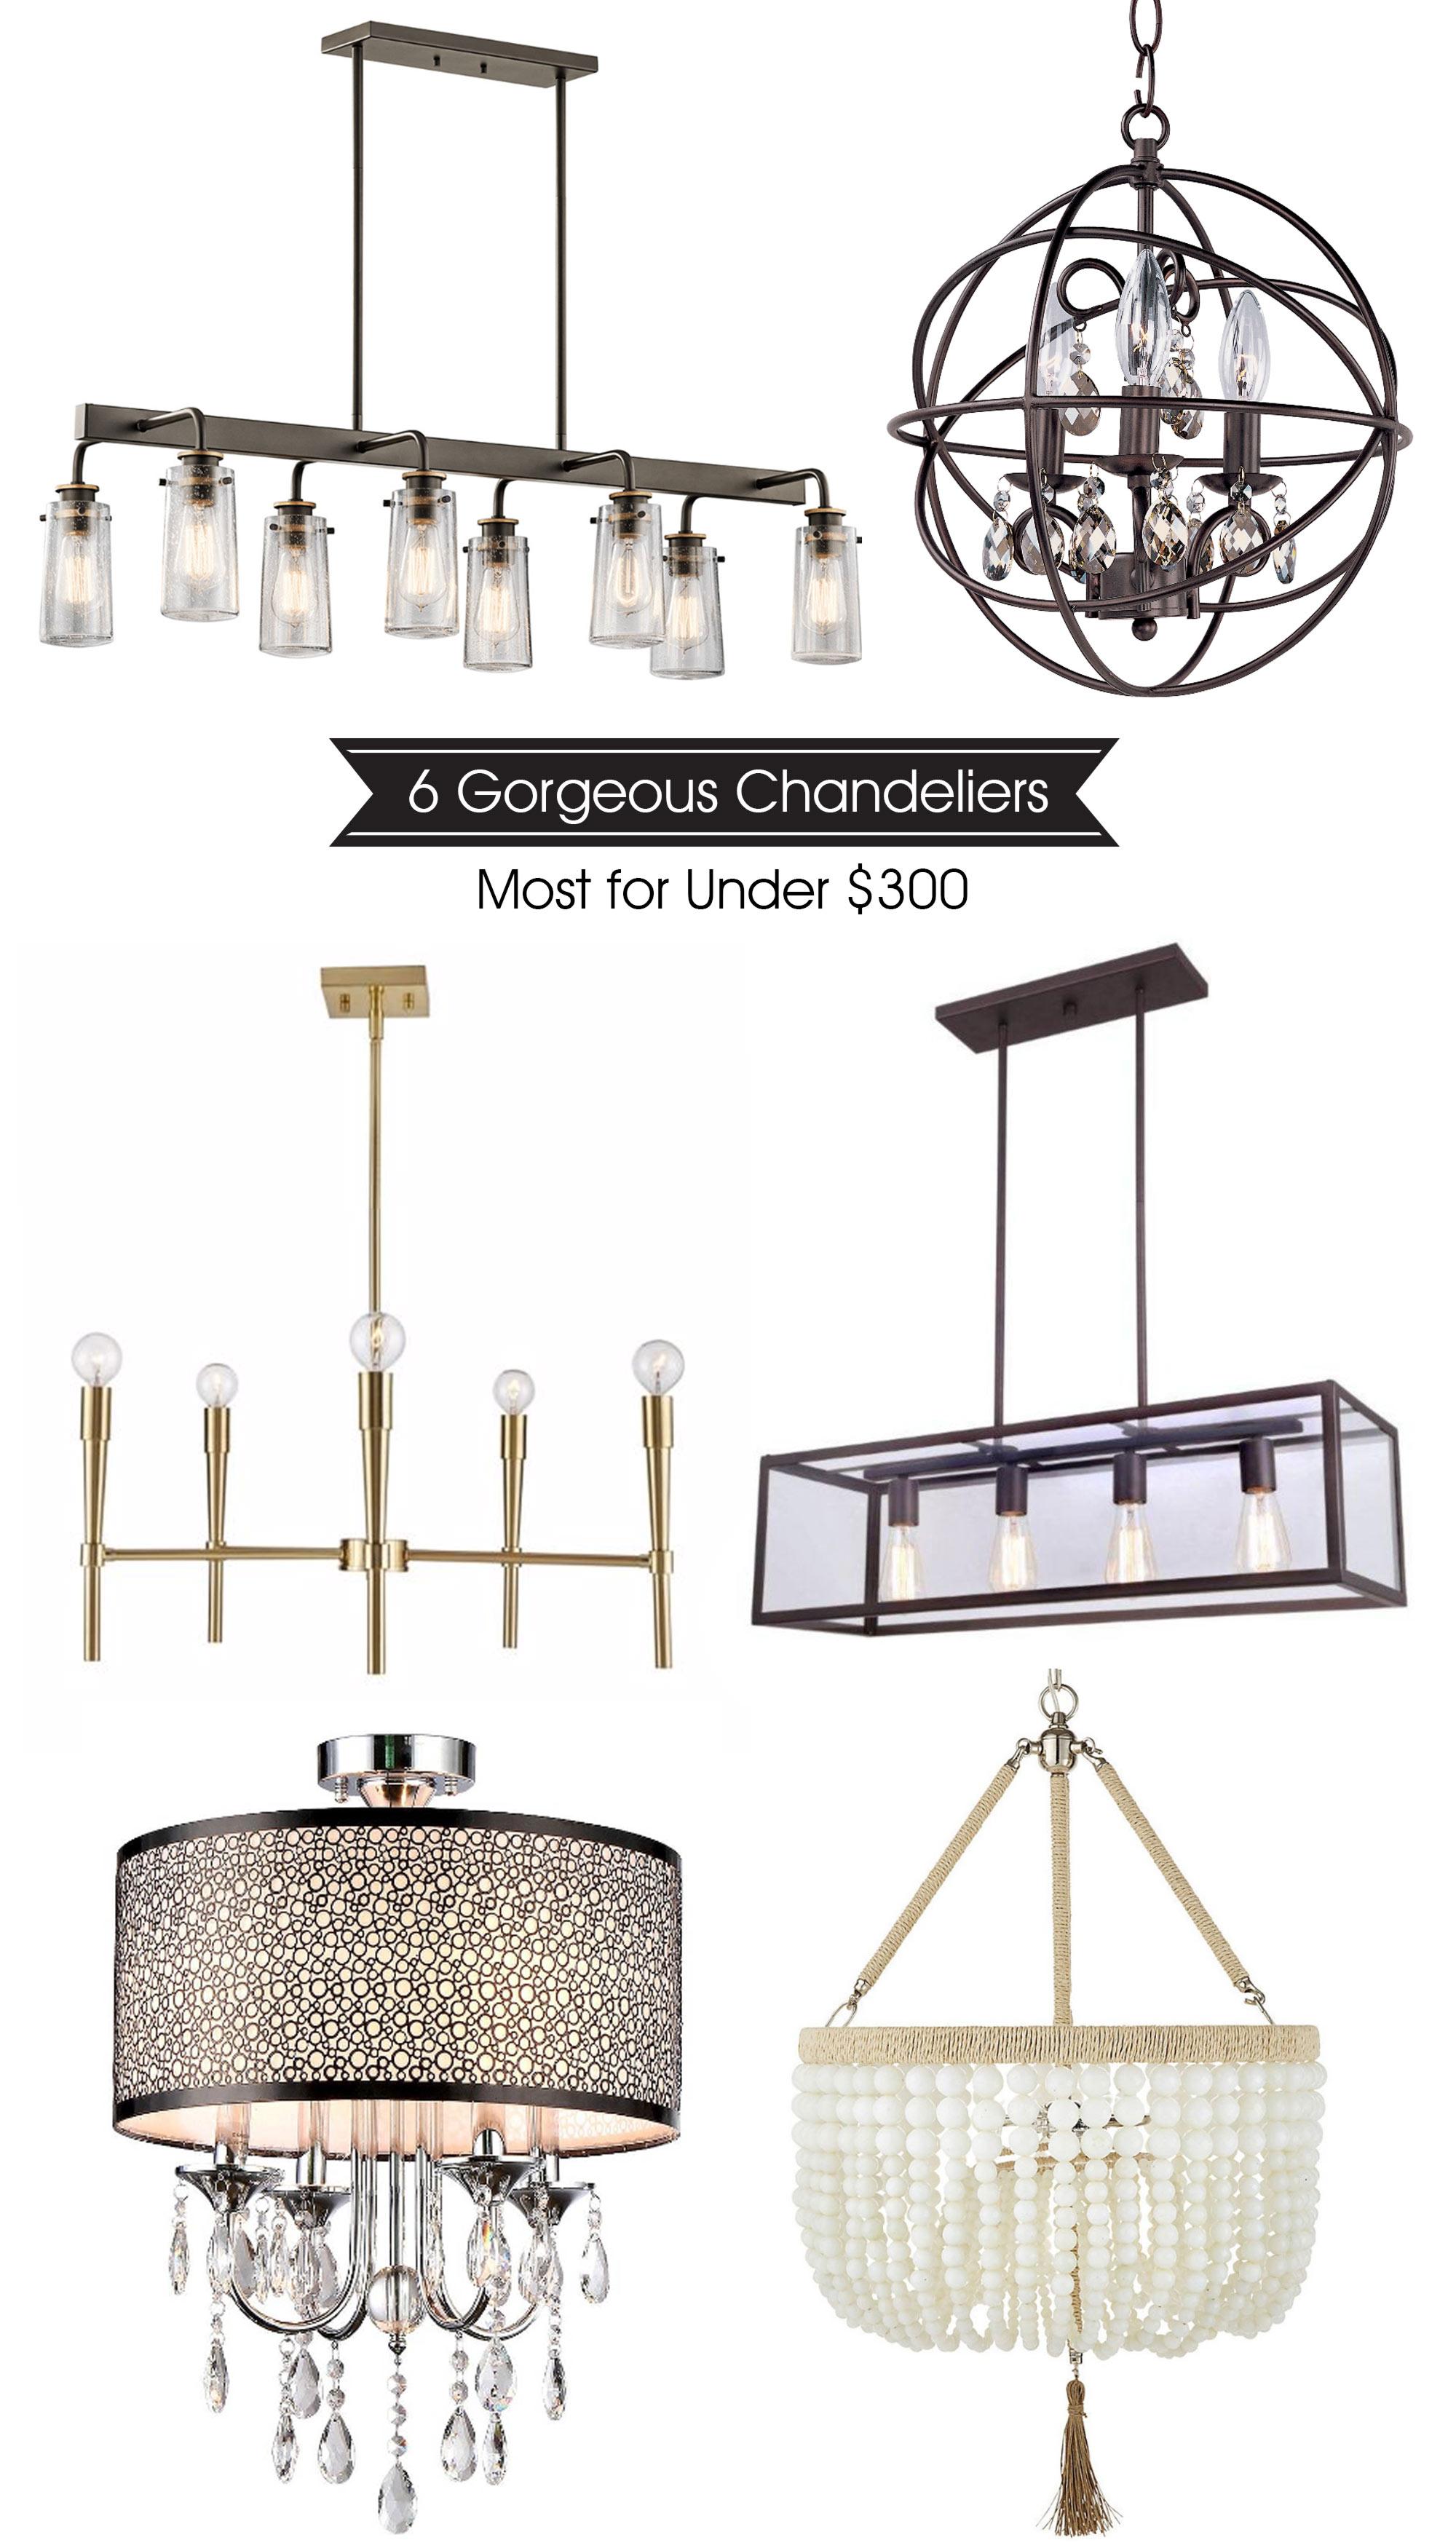 6-chandeliers-under-300